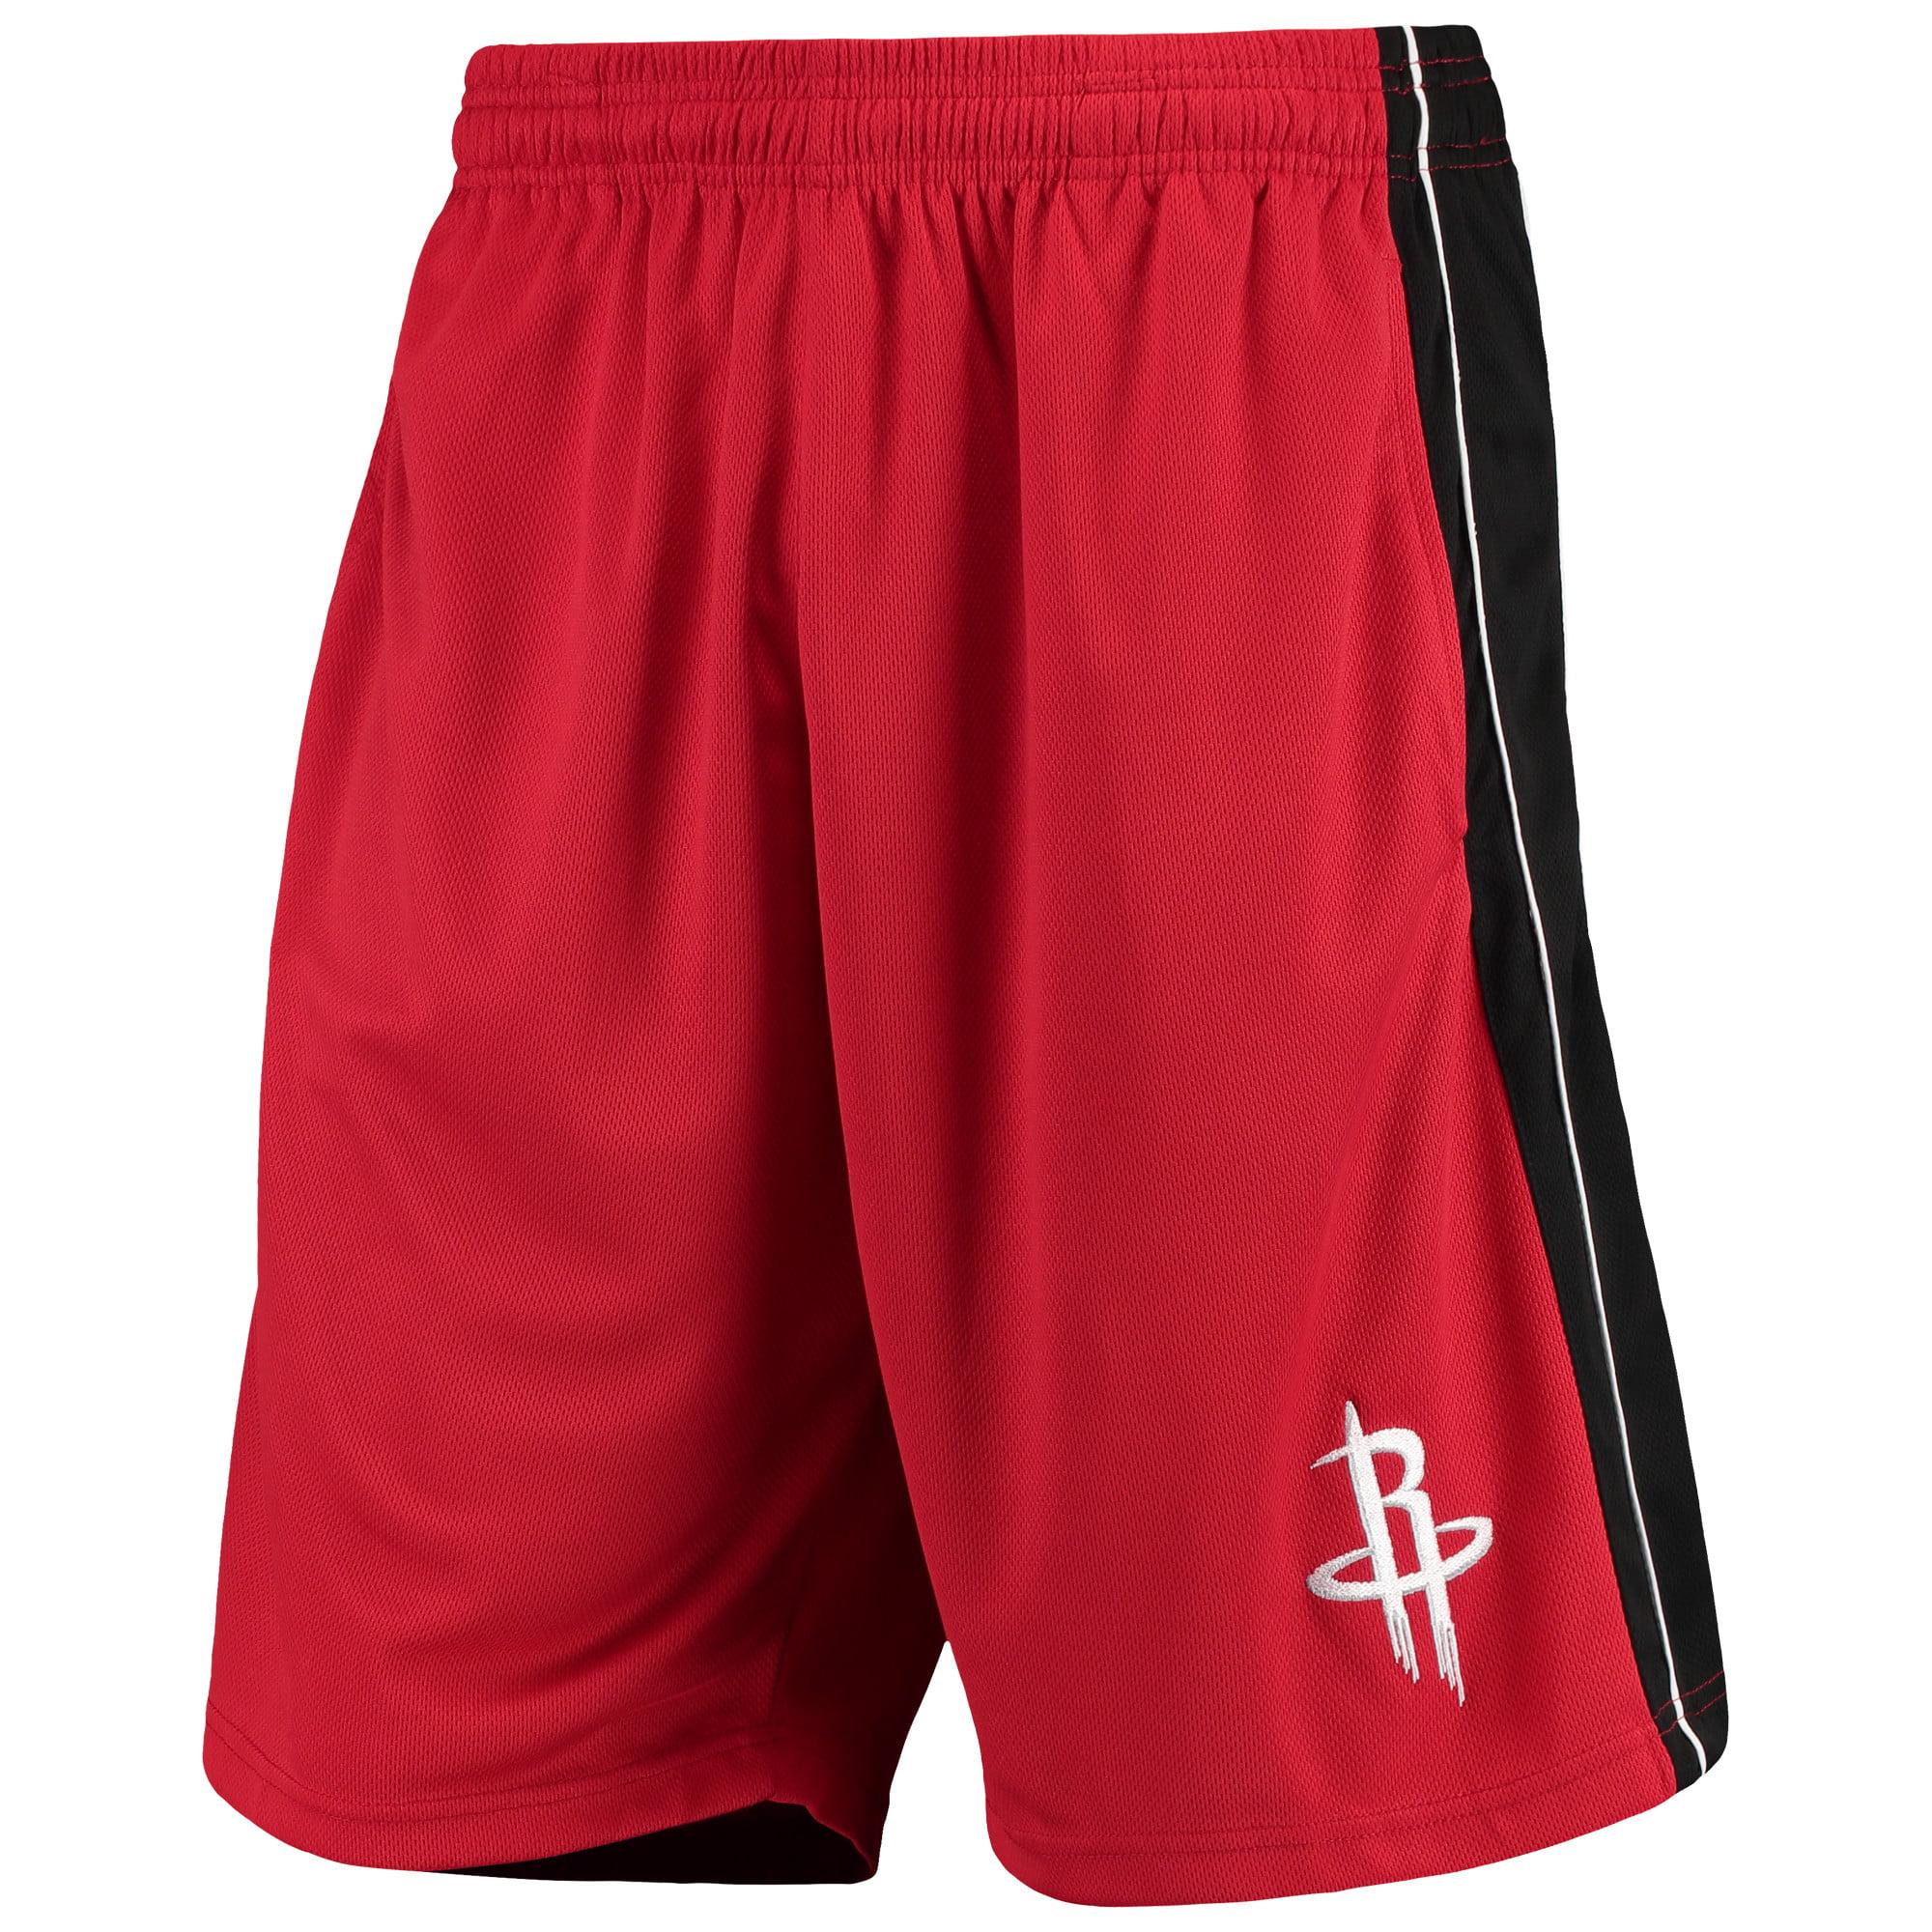 Houston Rockets Majestic Big & Tall Birdseye Shorts - Red/Black